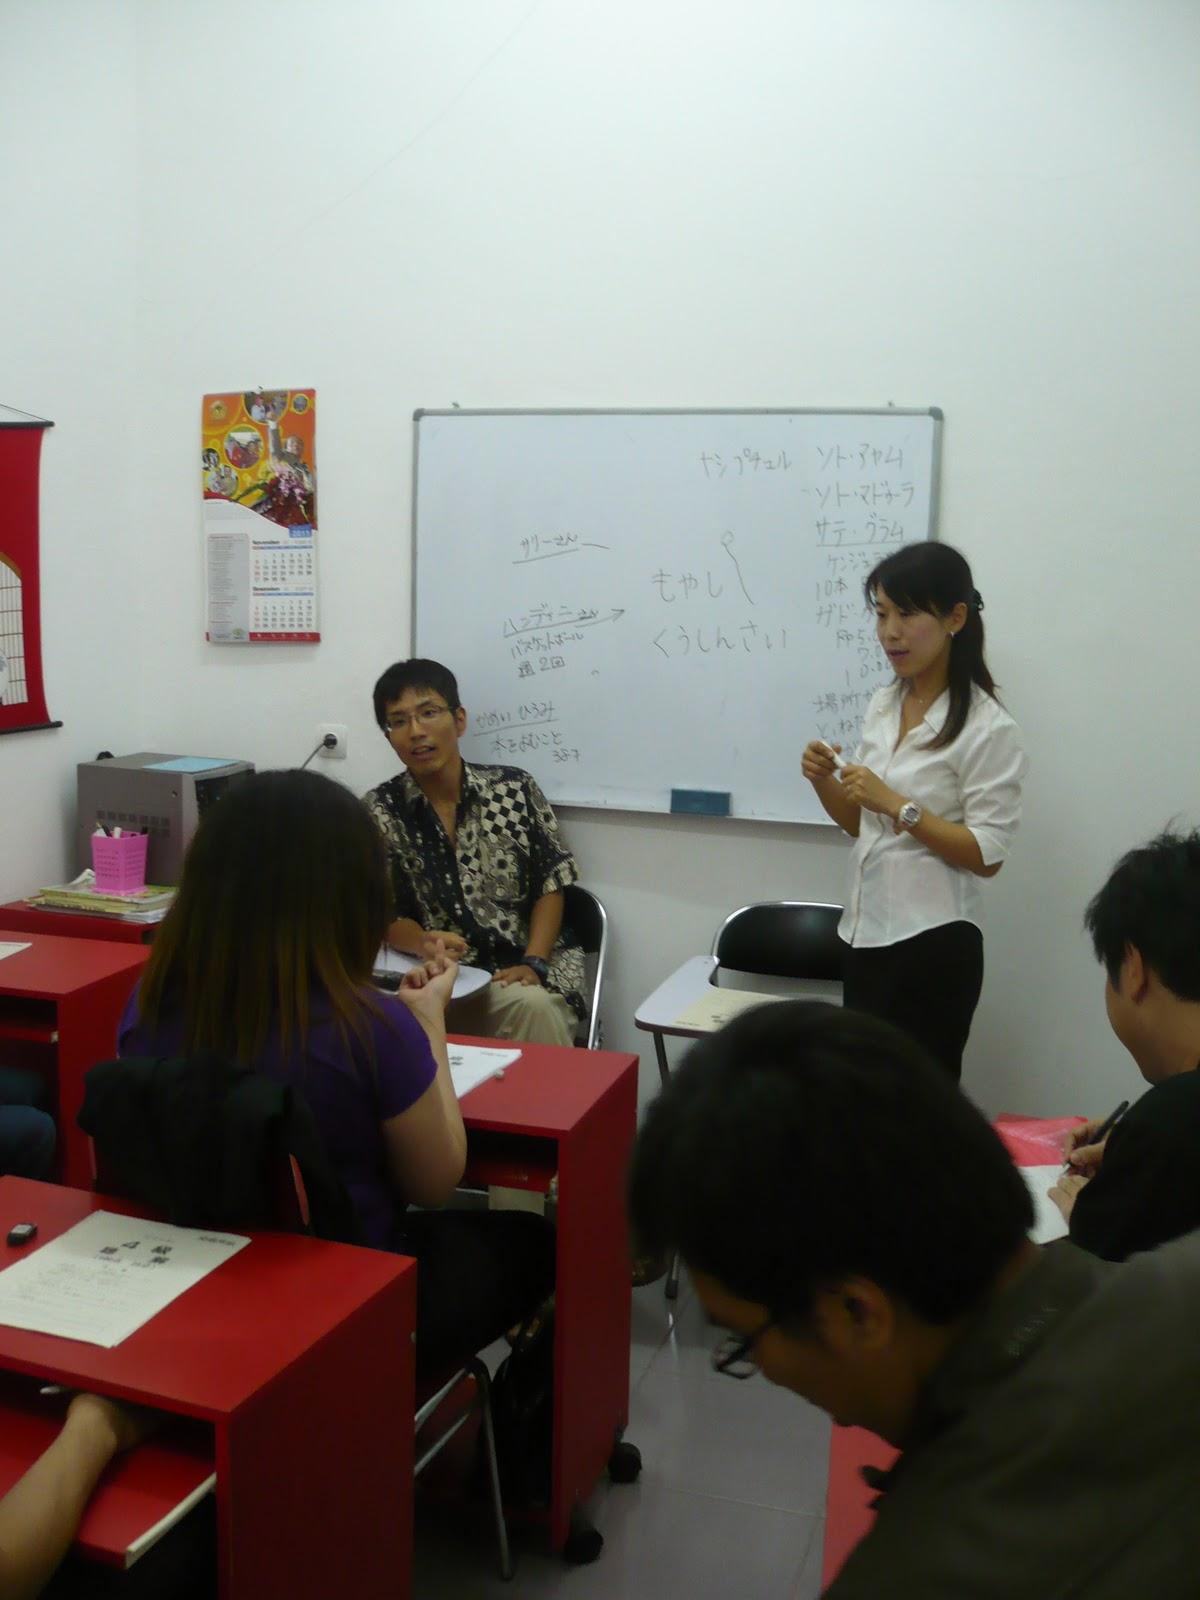 Shinju Kursus Bahasa Jepang Surabaya Indonesia Kegiatan Proses